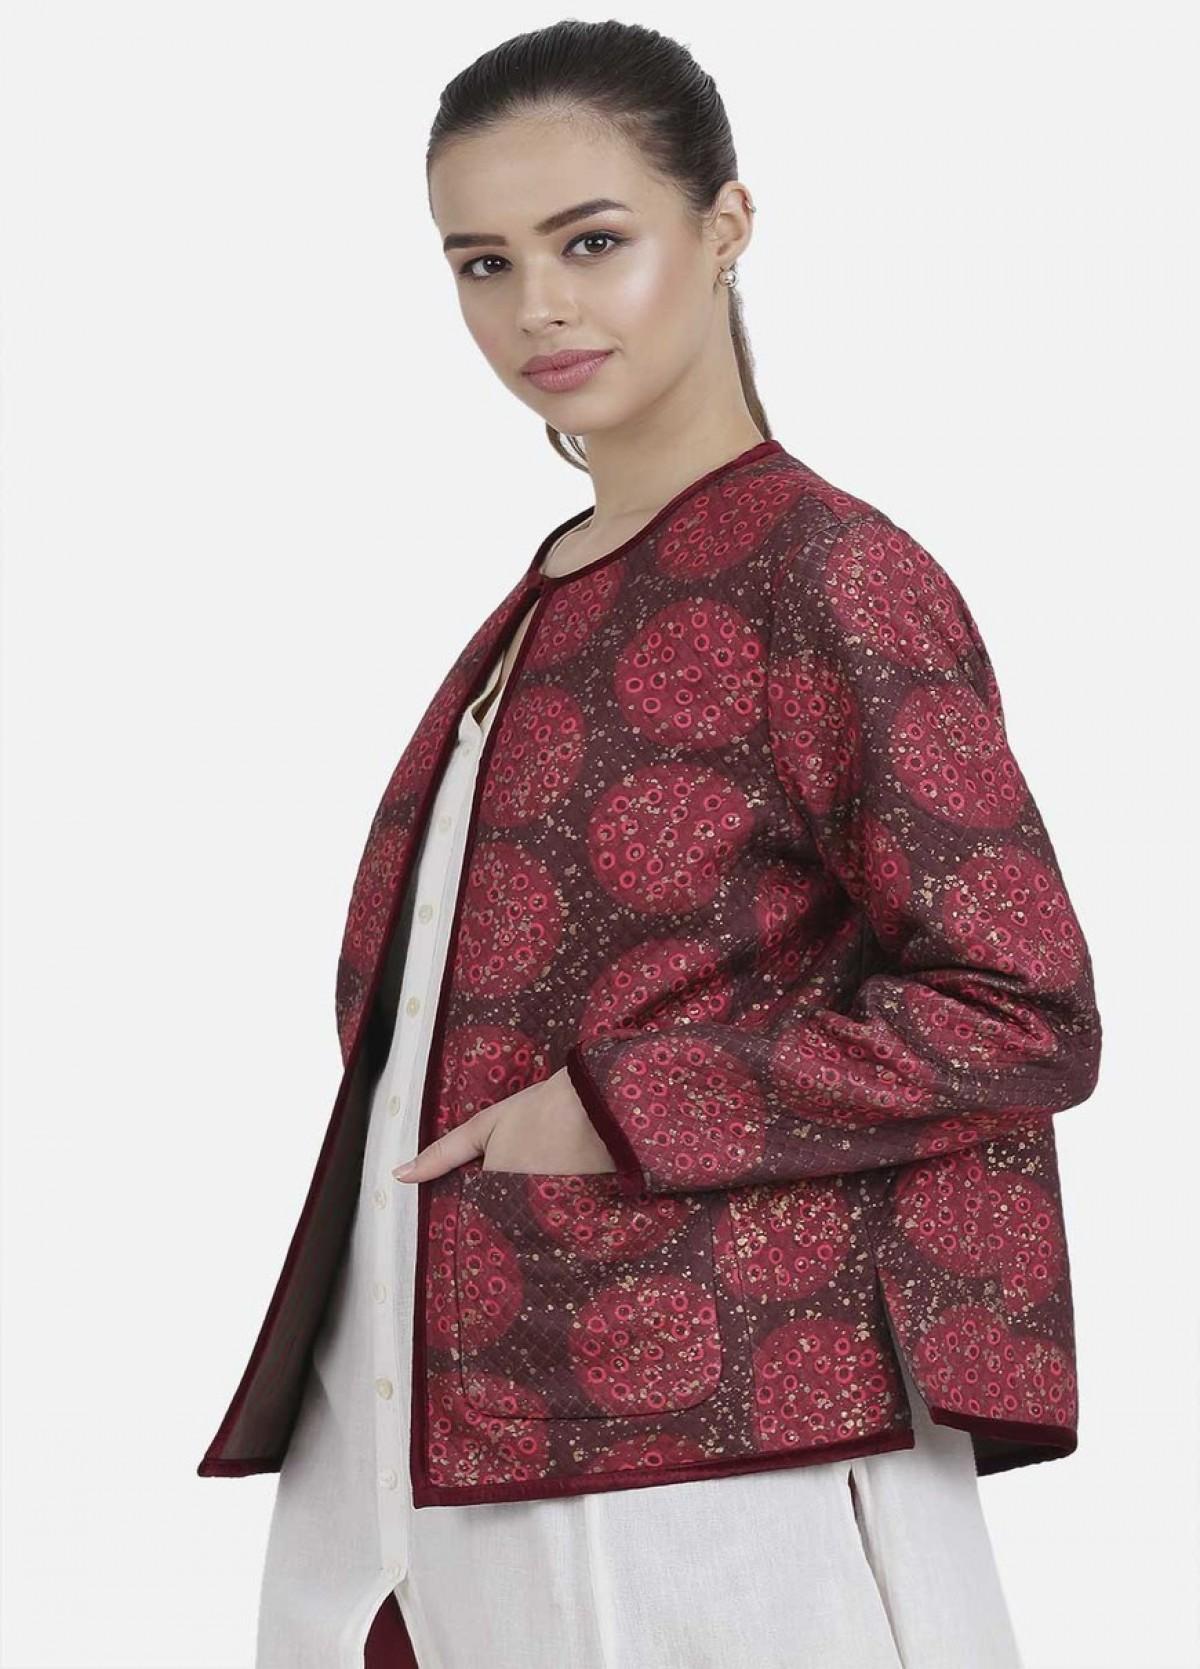 The Frieda Jacket